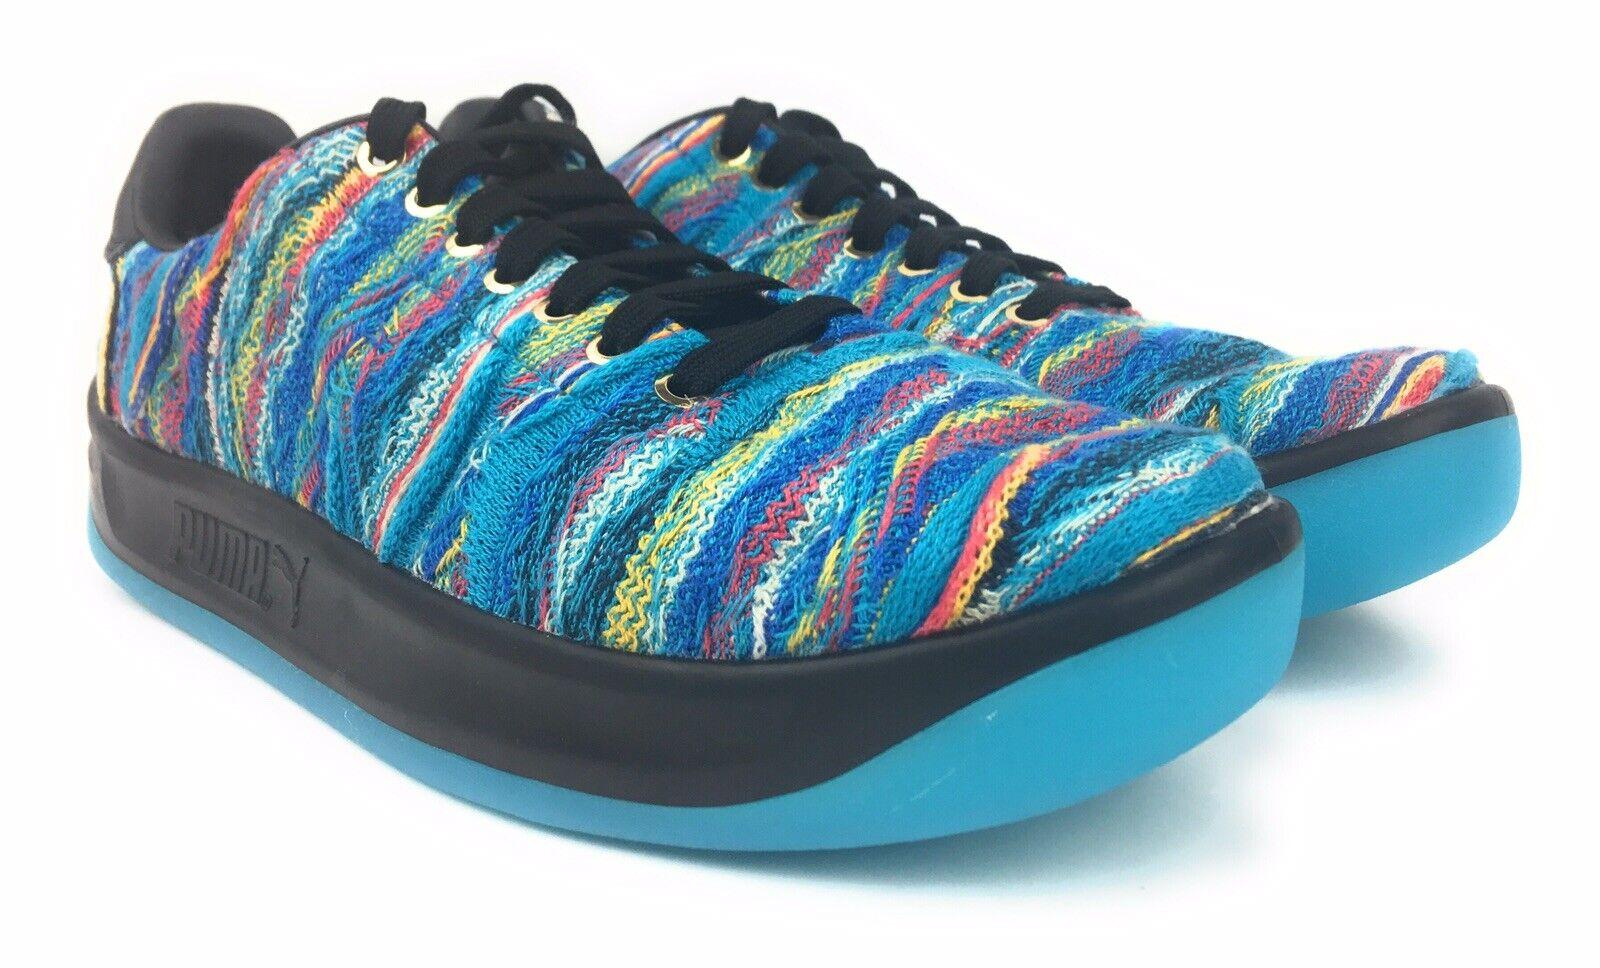 New Puma California Coogi Multi bluee Textile Sneakers shoes 36797301 Mens Sz 10